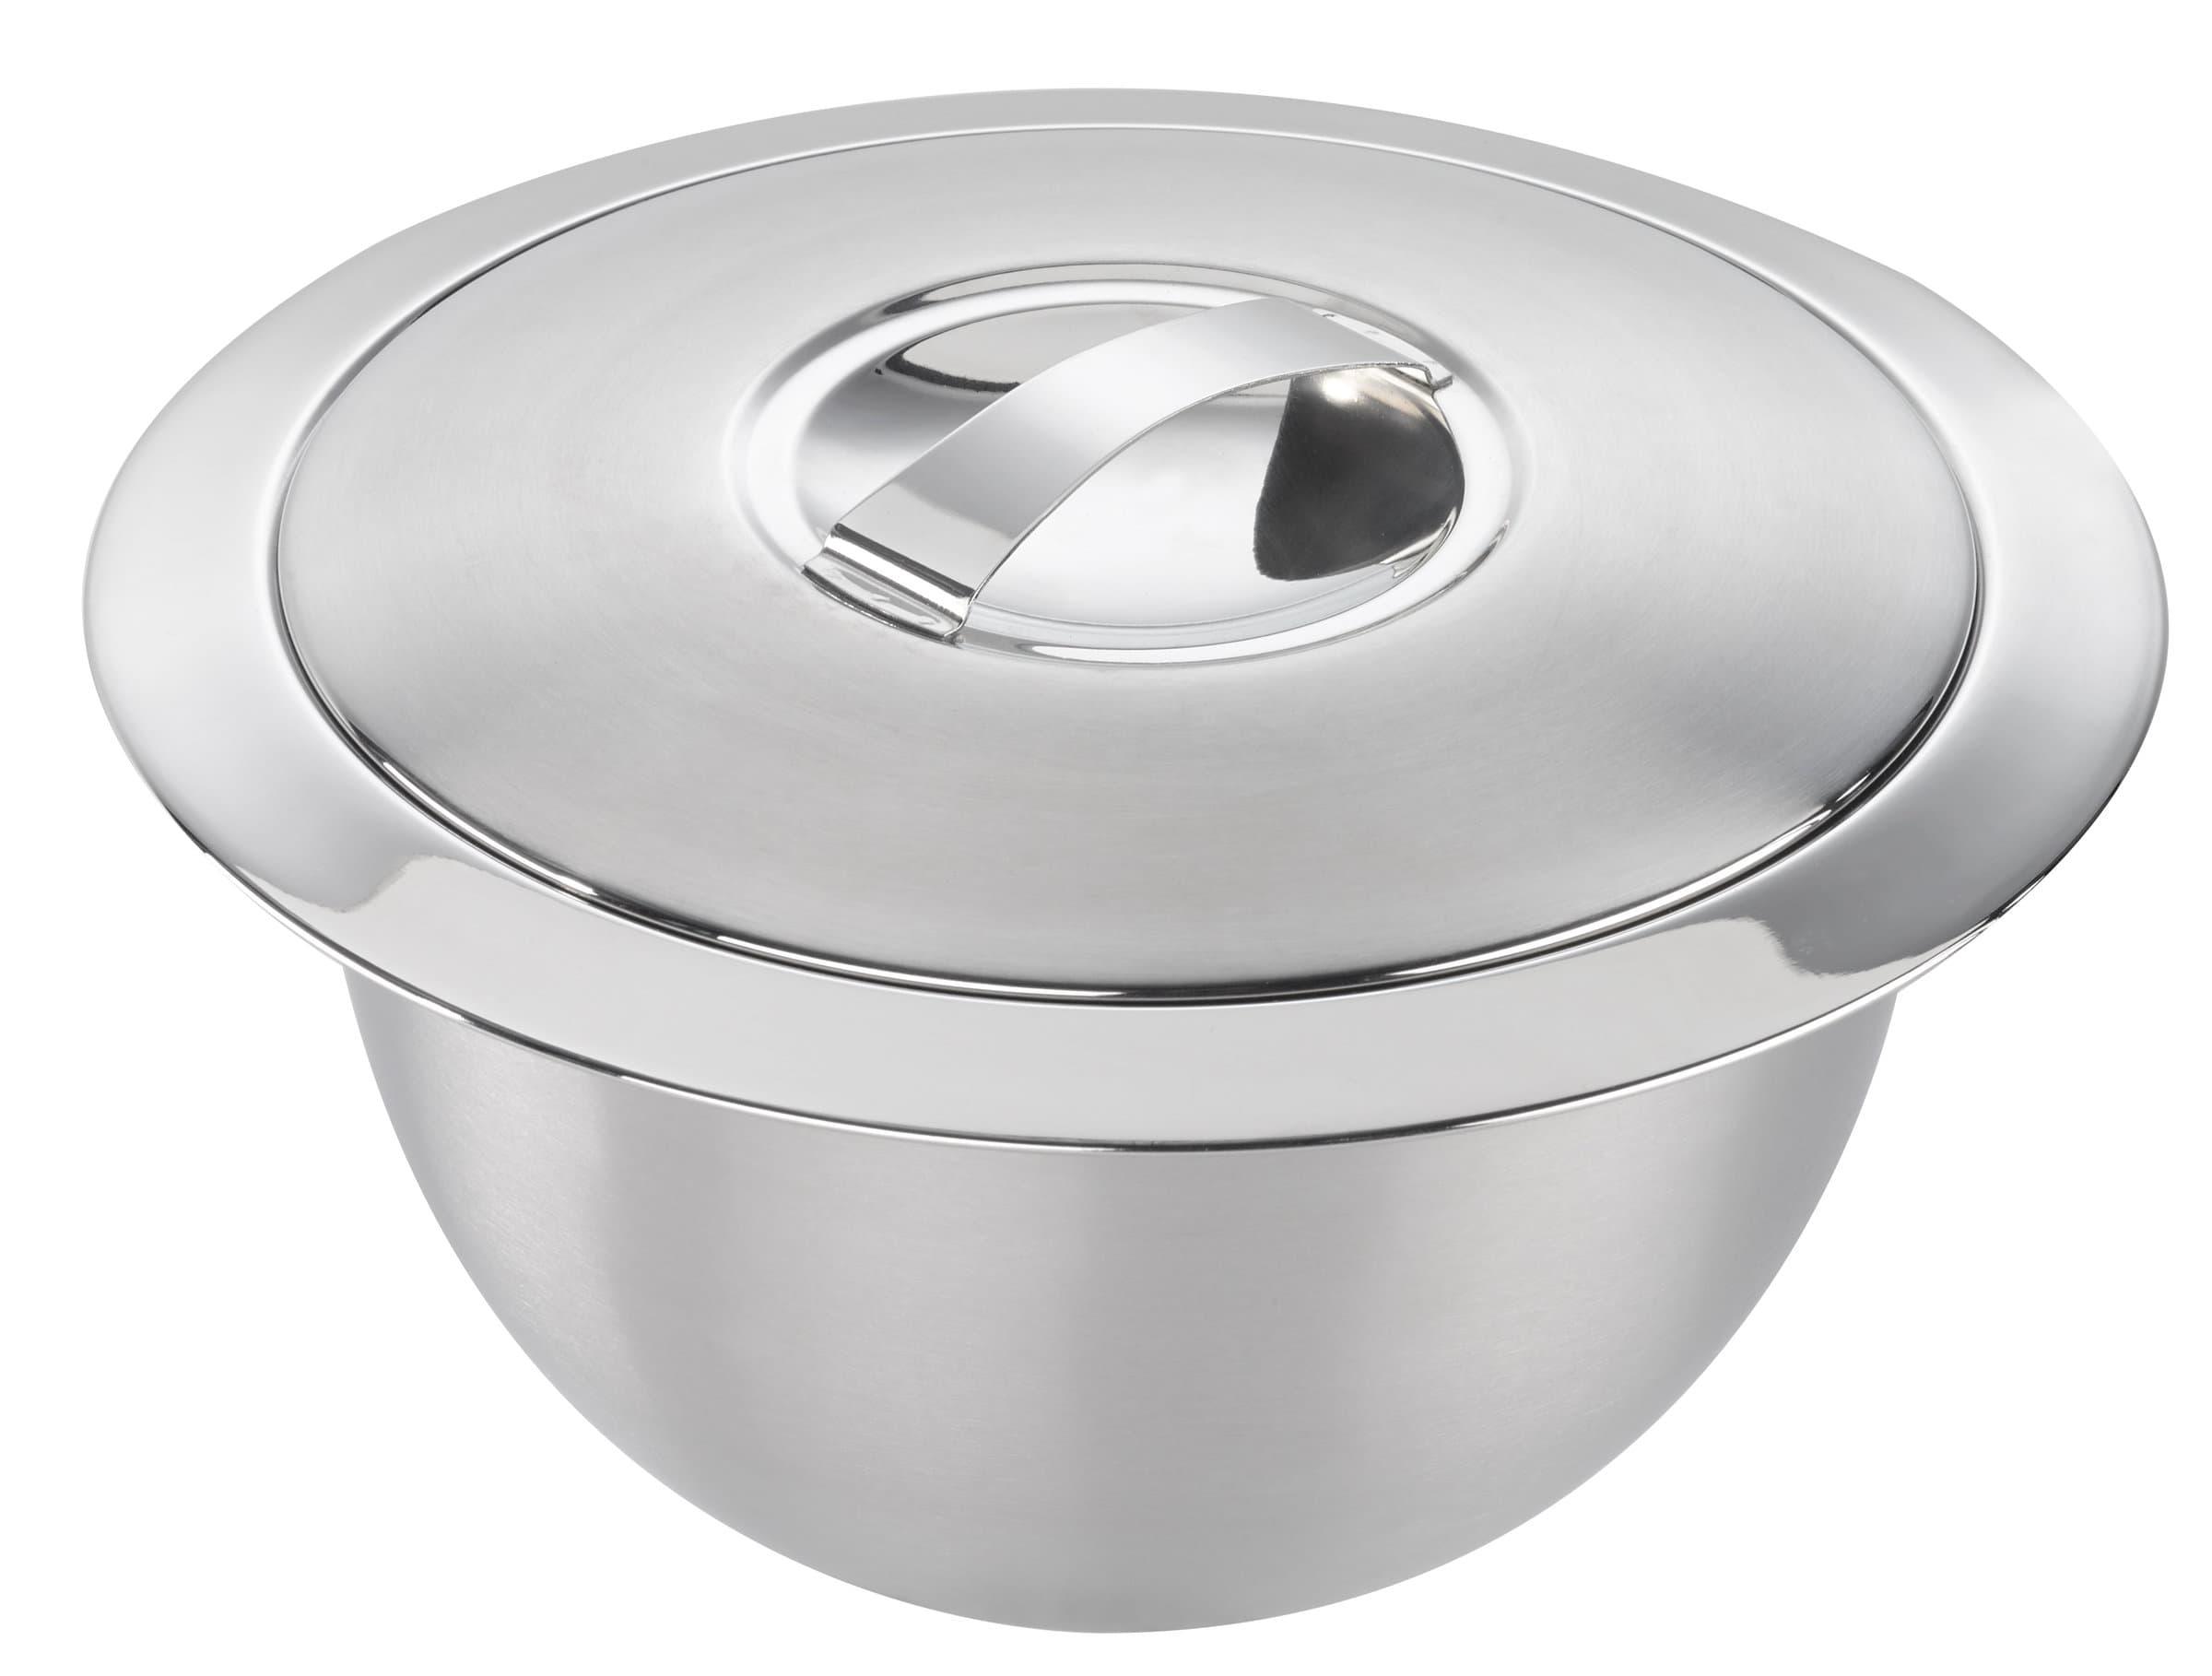 Cucina & Tavola Saladier isotherme 1.5L